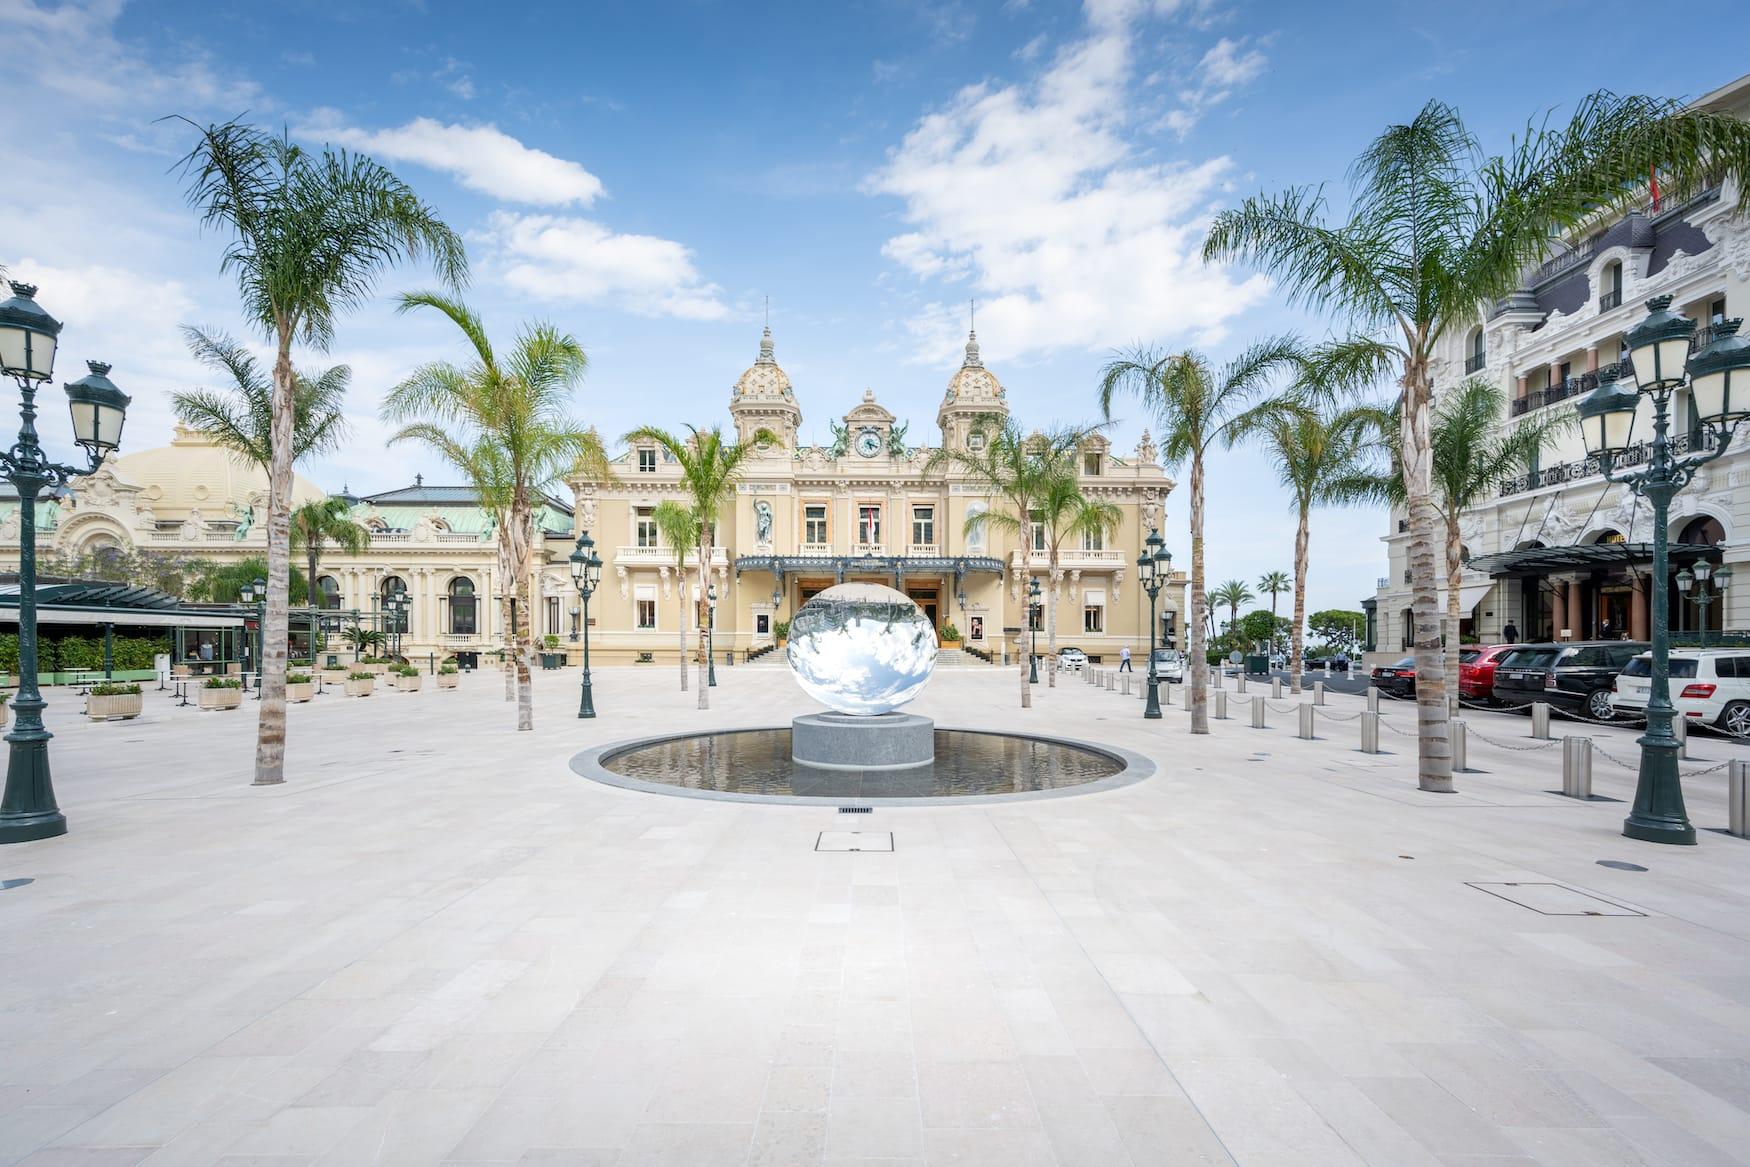 Platz vor dem Casino in Montecarlo